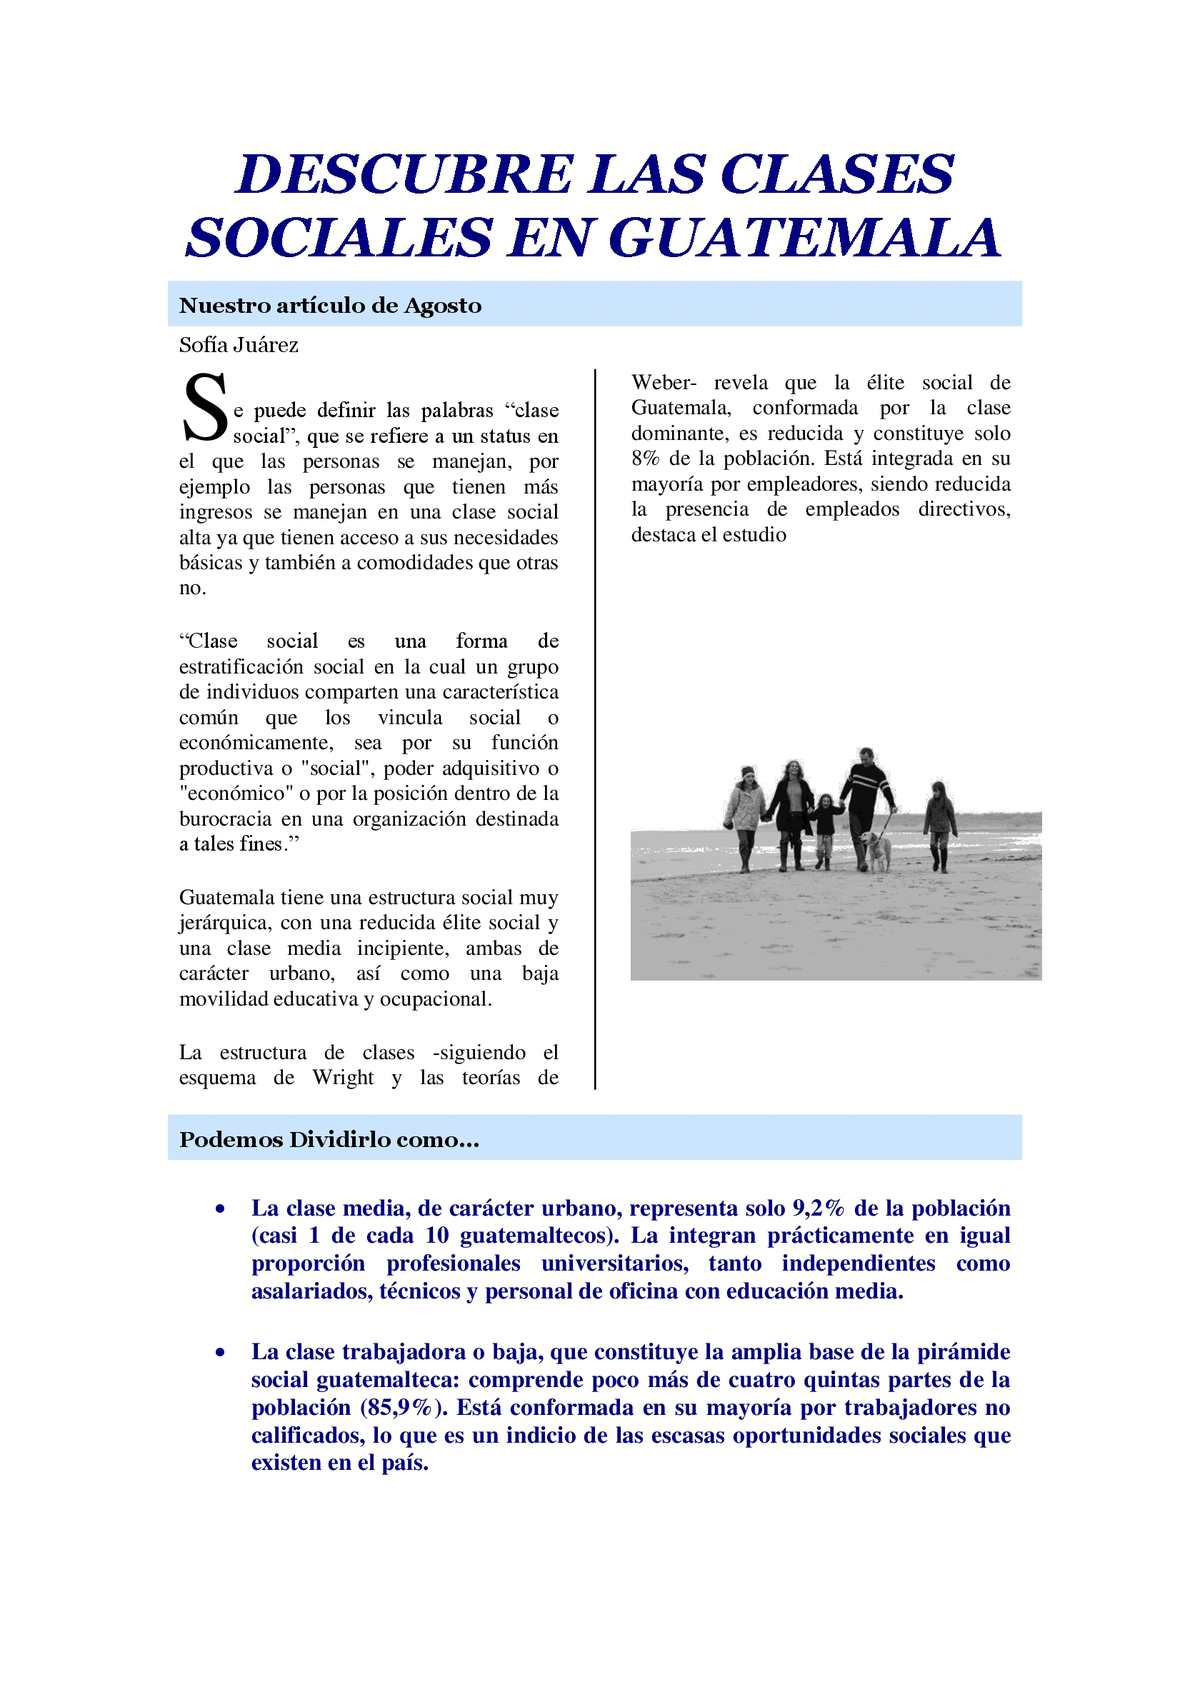 Calaméo - DESCUBRE LAS CLASES SOCIALES EN GUATEMALA